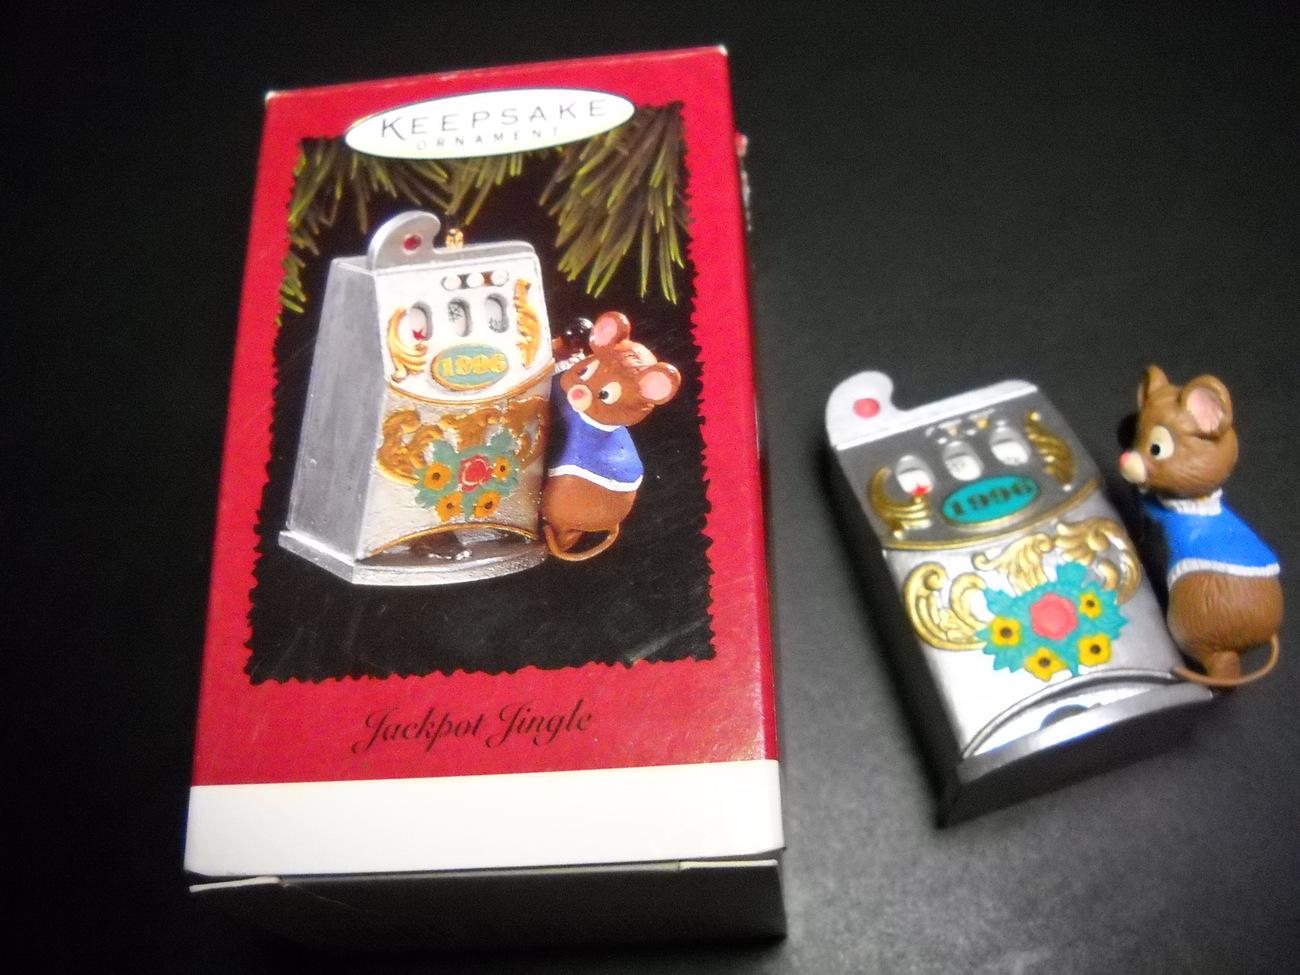 Christmas ornament hallmark keepsake jackpot jingle 1996 01